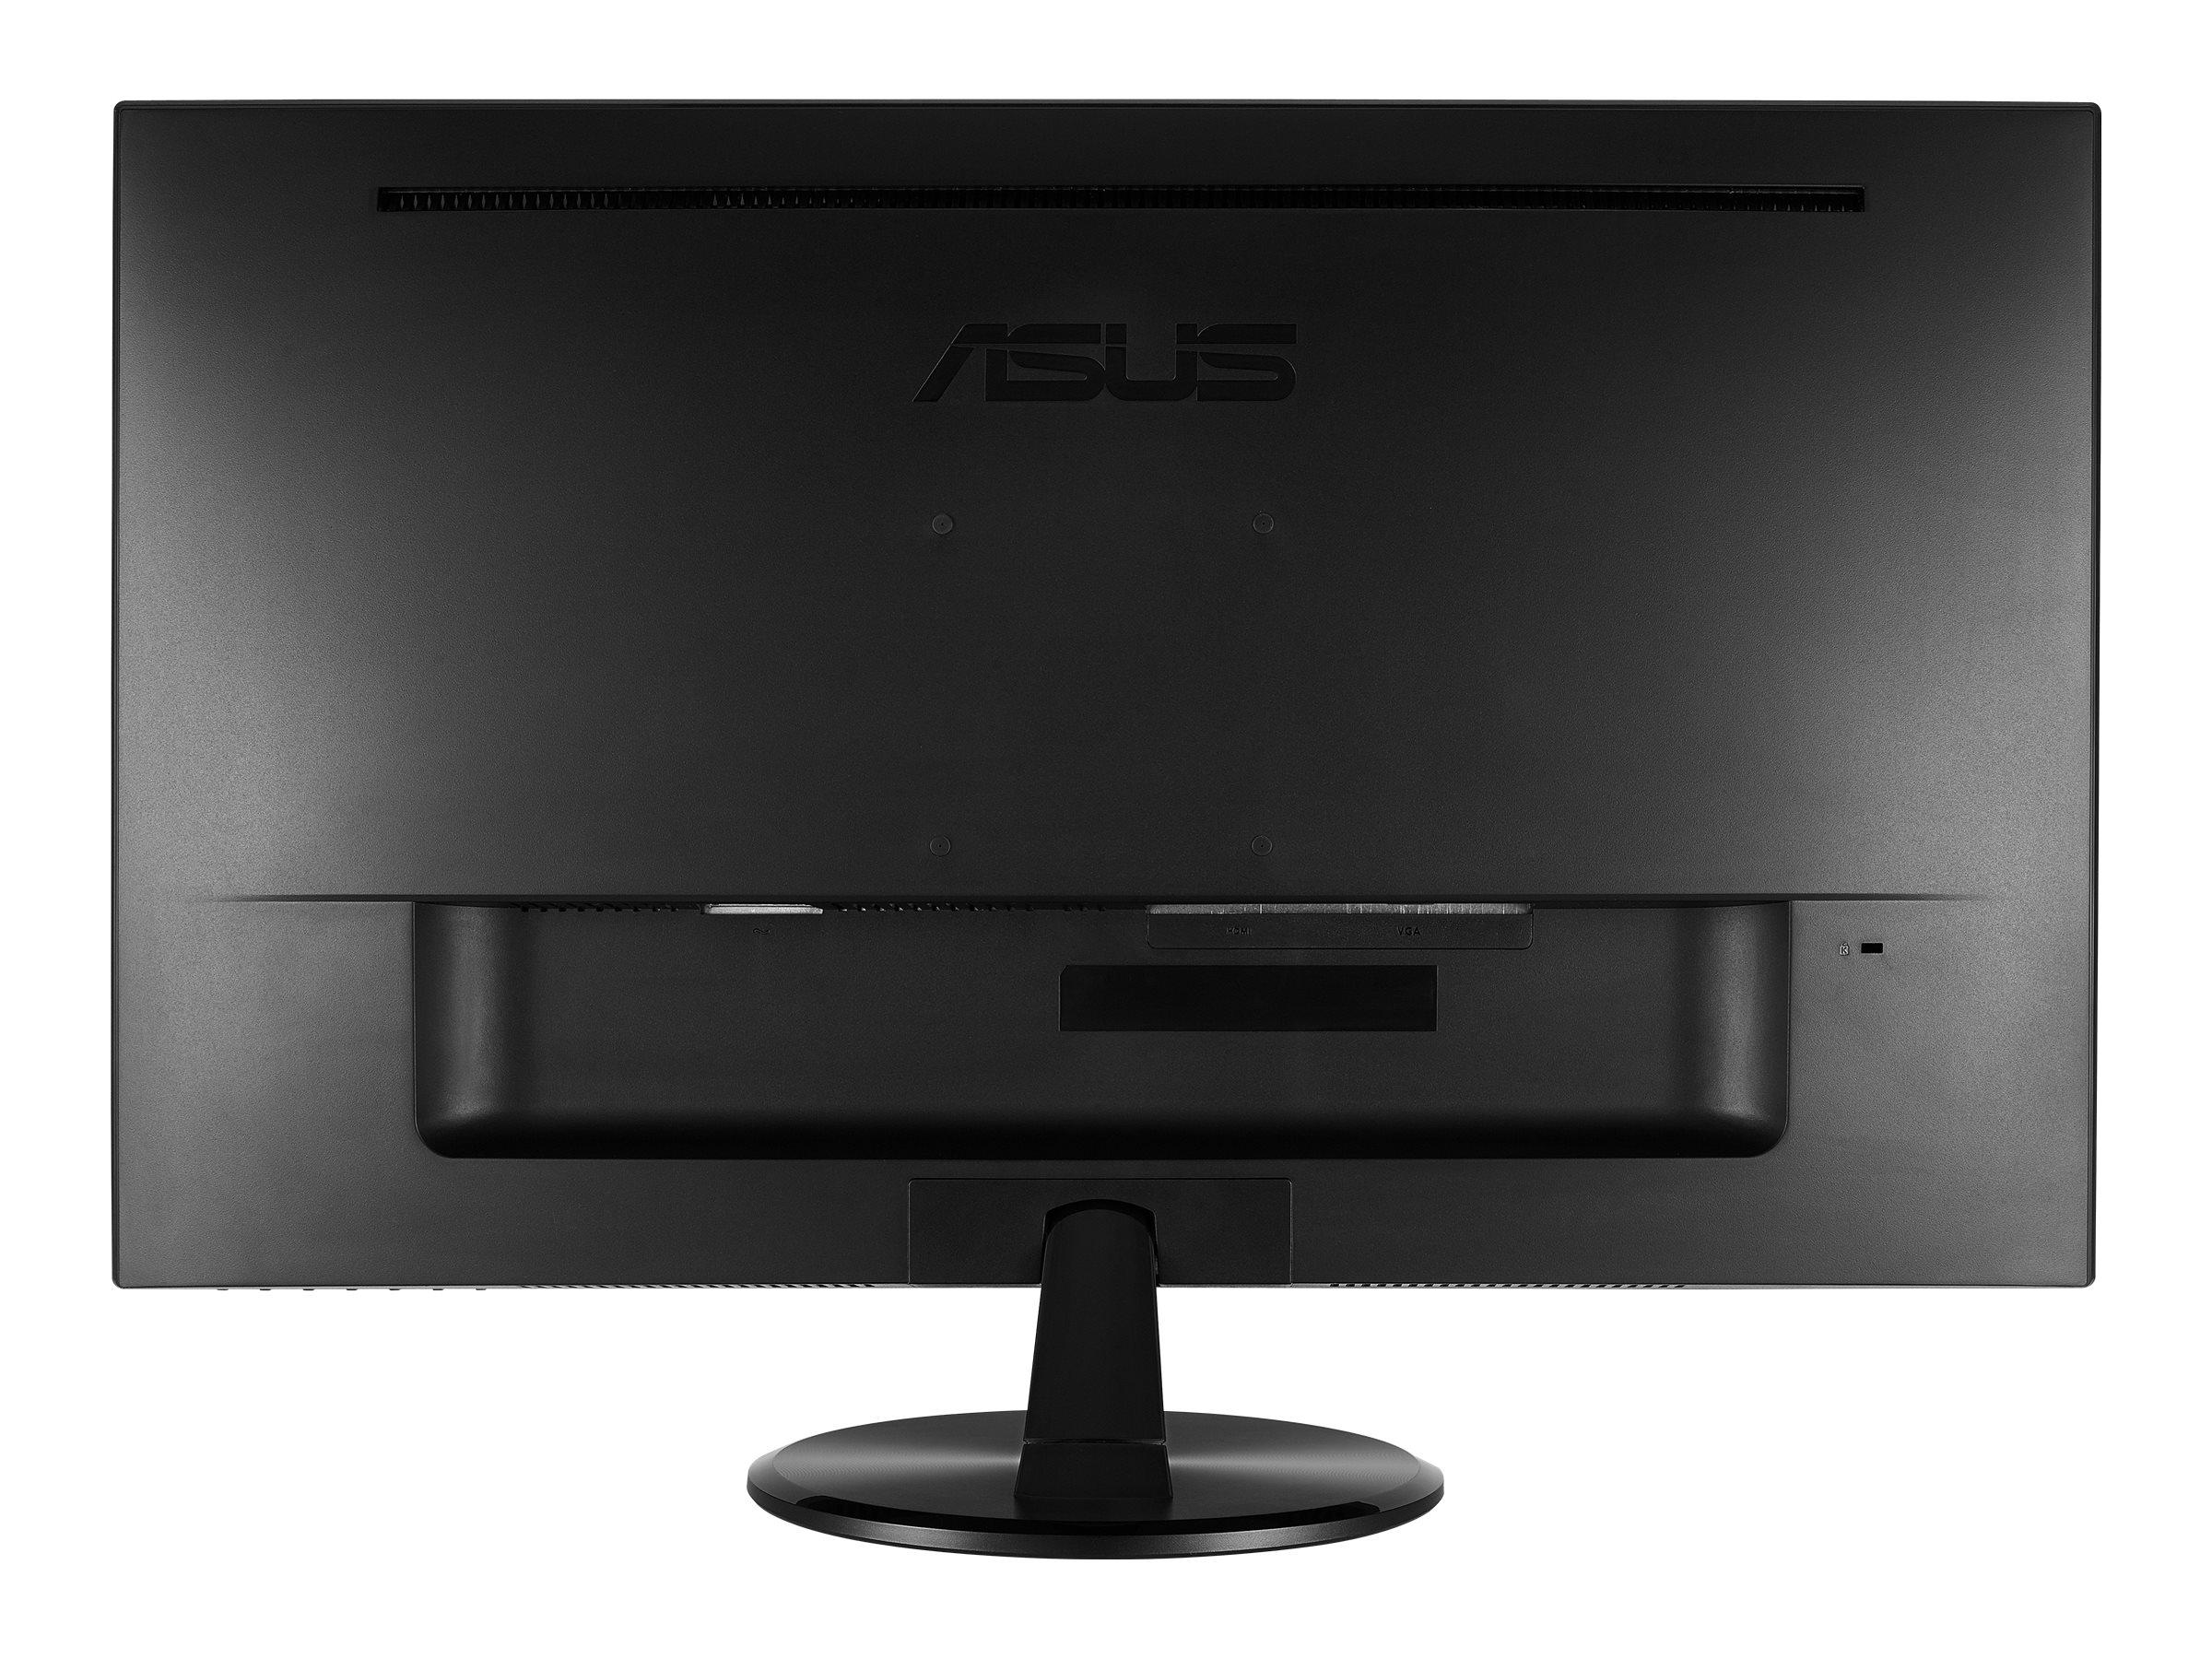 "ASUS VP247HAE - LED-Monitor - 59.9 cm (23.6"") - 1920 x 1080 Full HD (1080p)"